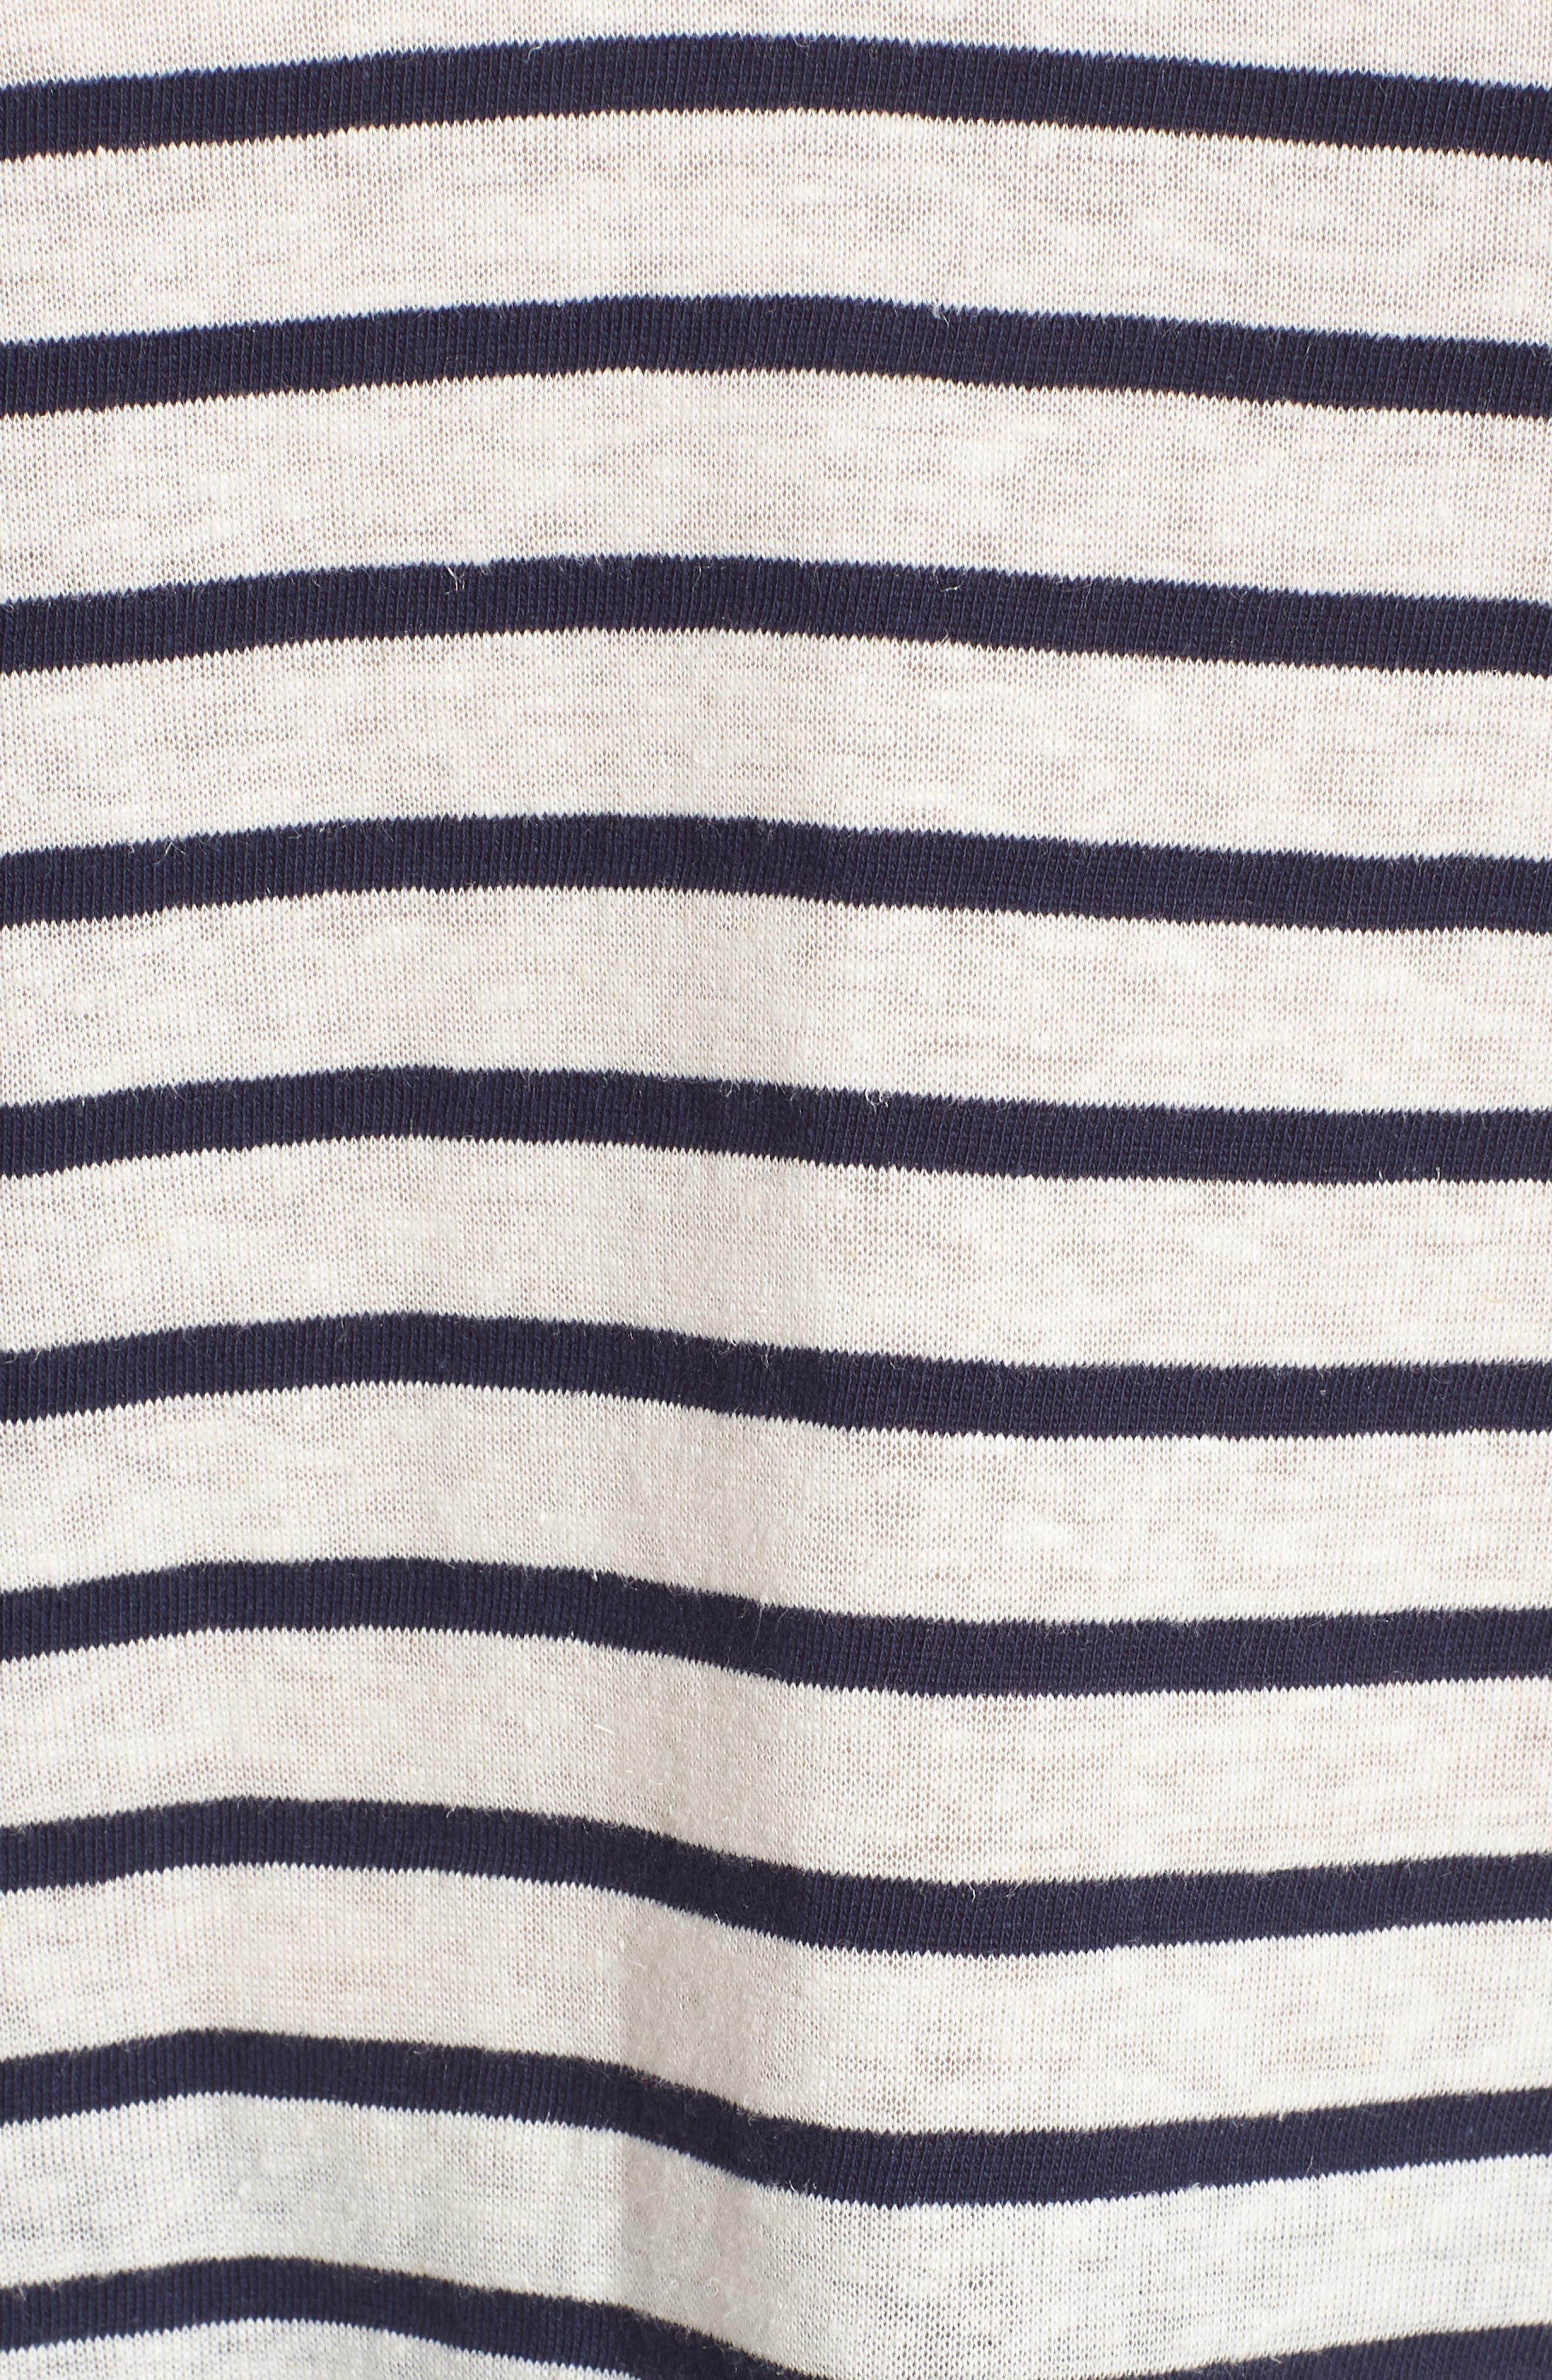 Stripe V-Neck Tee,                             Alternate thumbnail 5, color,                             Navy Stripe